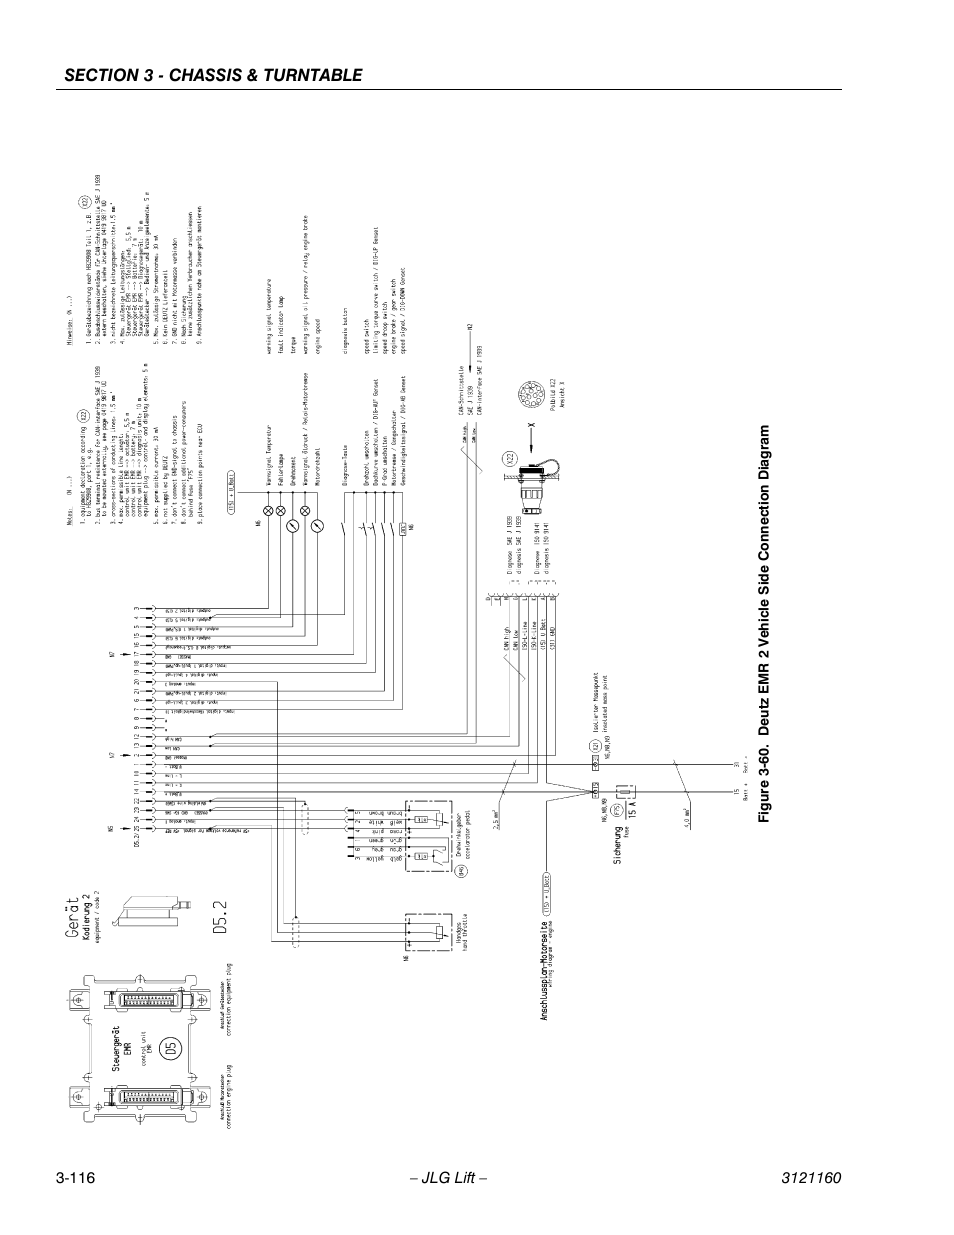 deutz emr2 wiring diagram dometic ac emr 2 vehicle side connection 116 jlg 740aj service manual user page 168 408